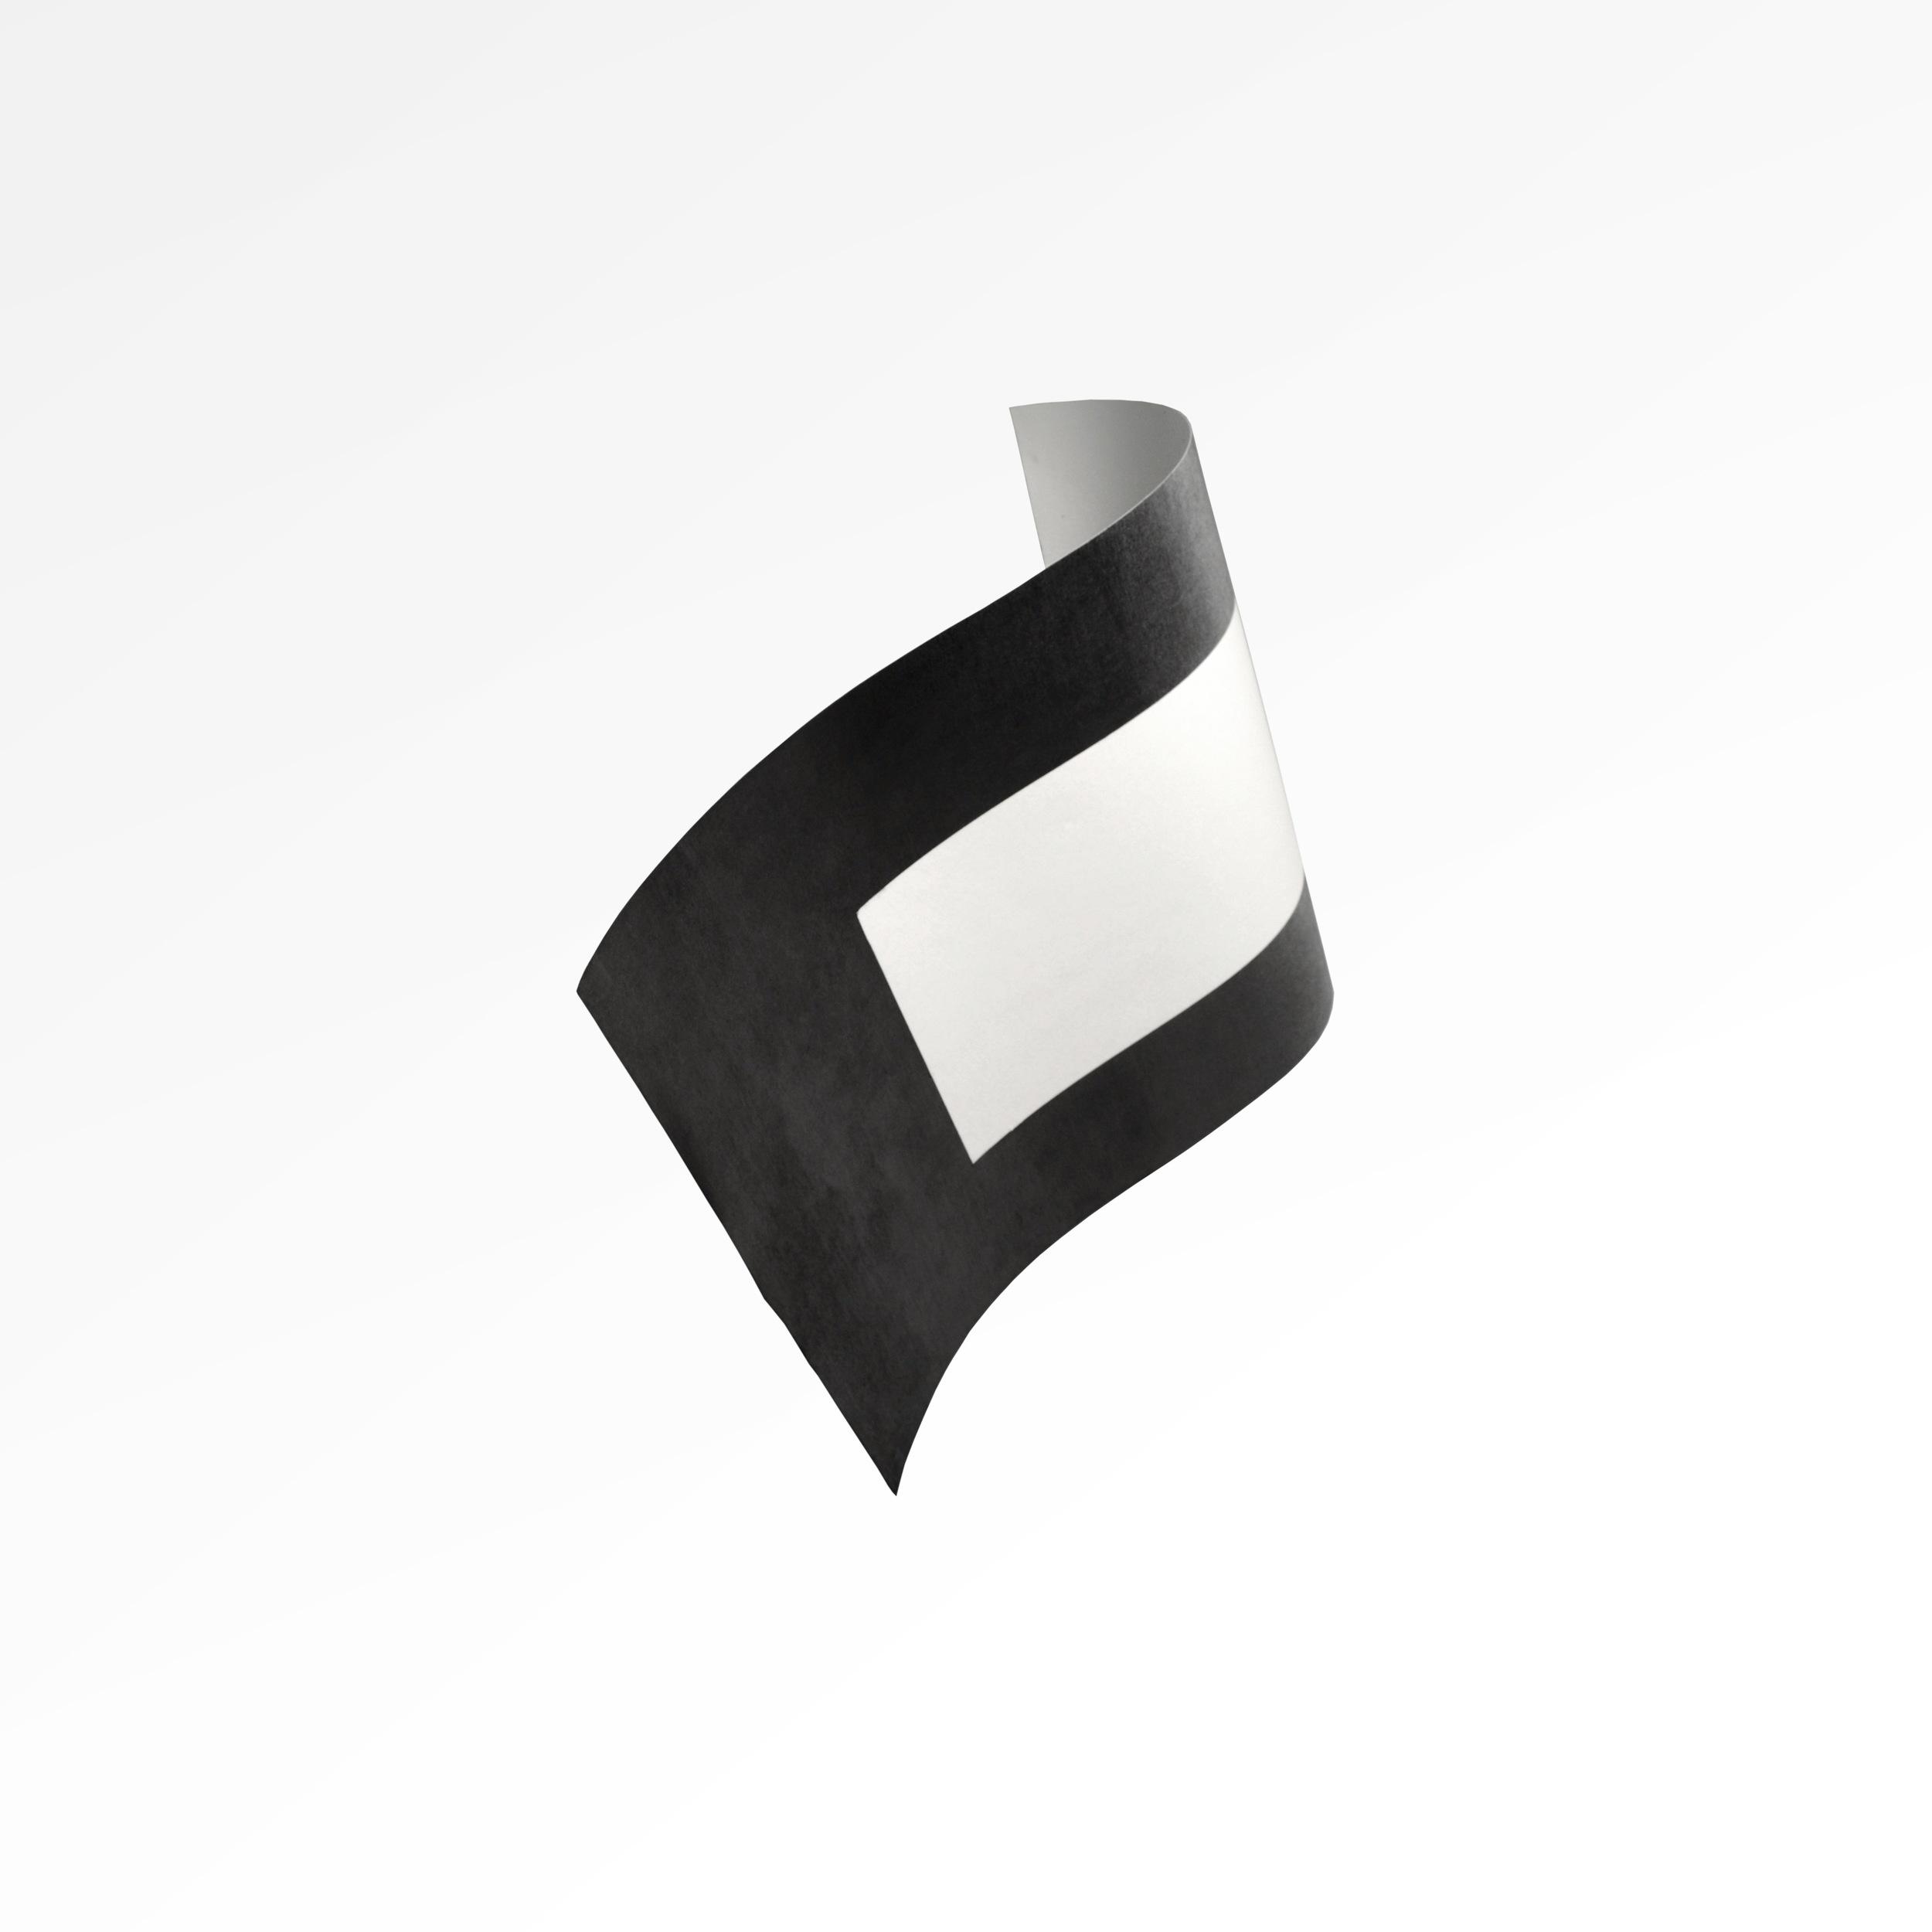 graphite on paper  2013